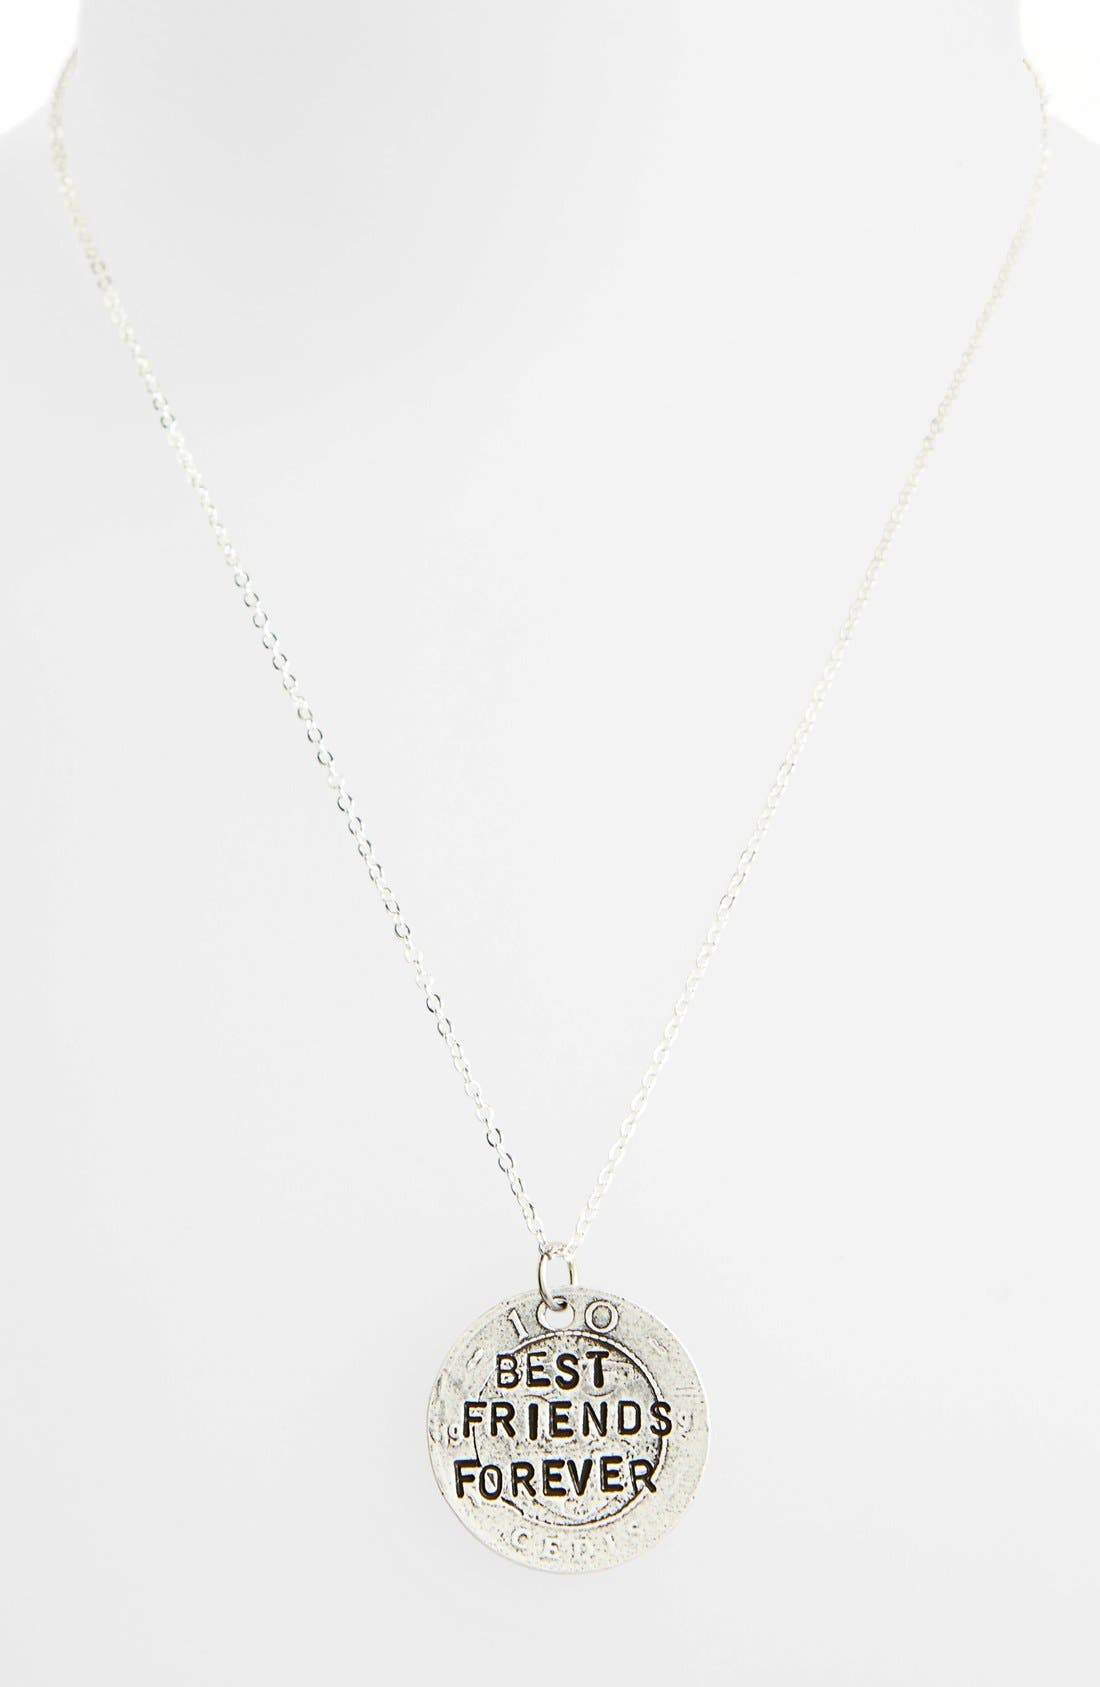 Alternate Image 1 Selected - Alisa Michelle Designs 'Best Friends Forever' Pendant Necklace